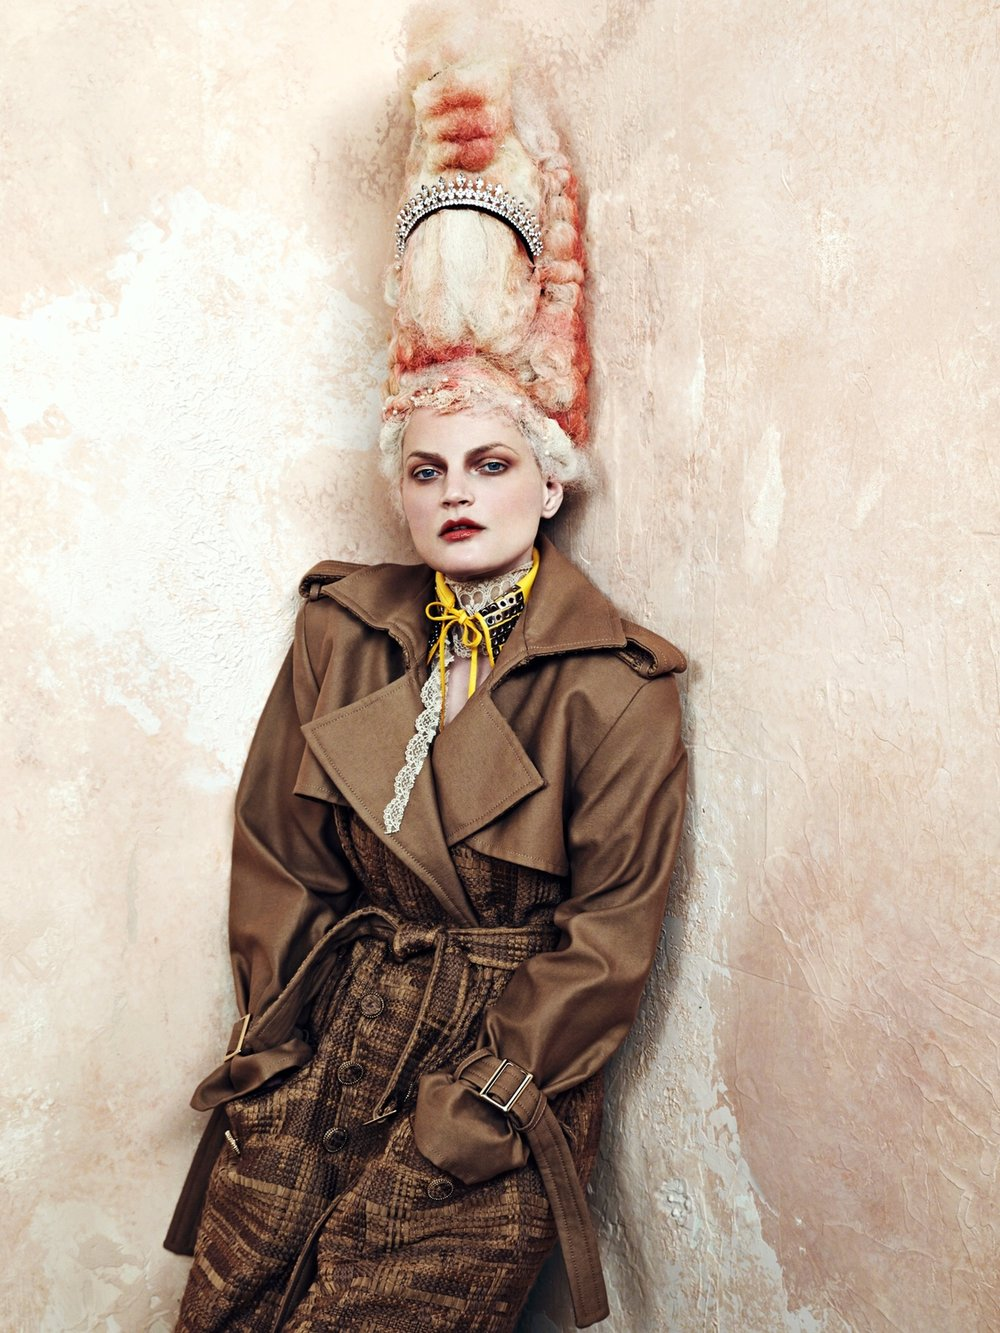 cr-fashion-book-no9-fall-winter-2016-guinevere-van-seenus-by-bjorn-iooss-06.jpg